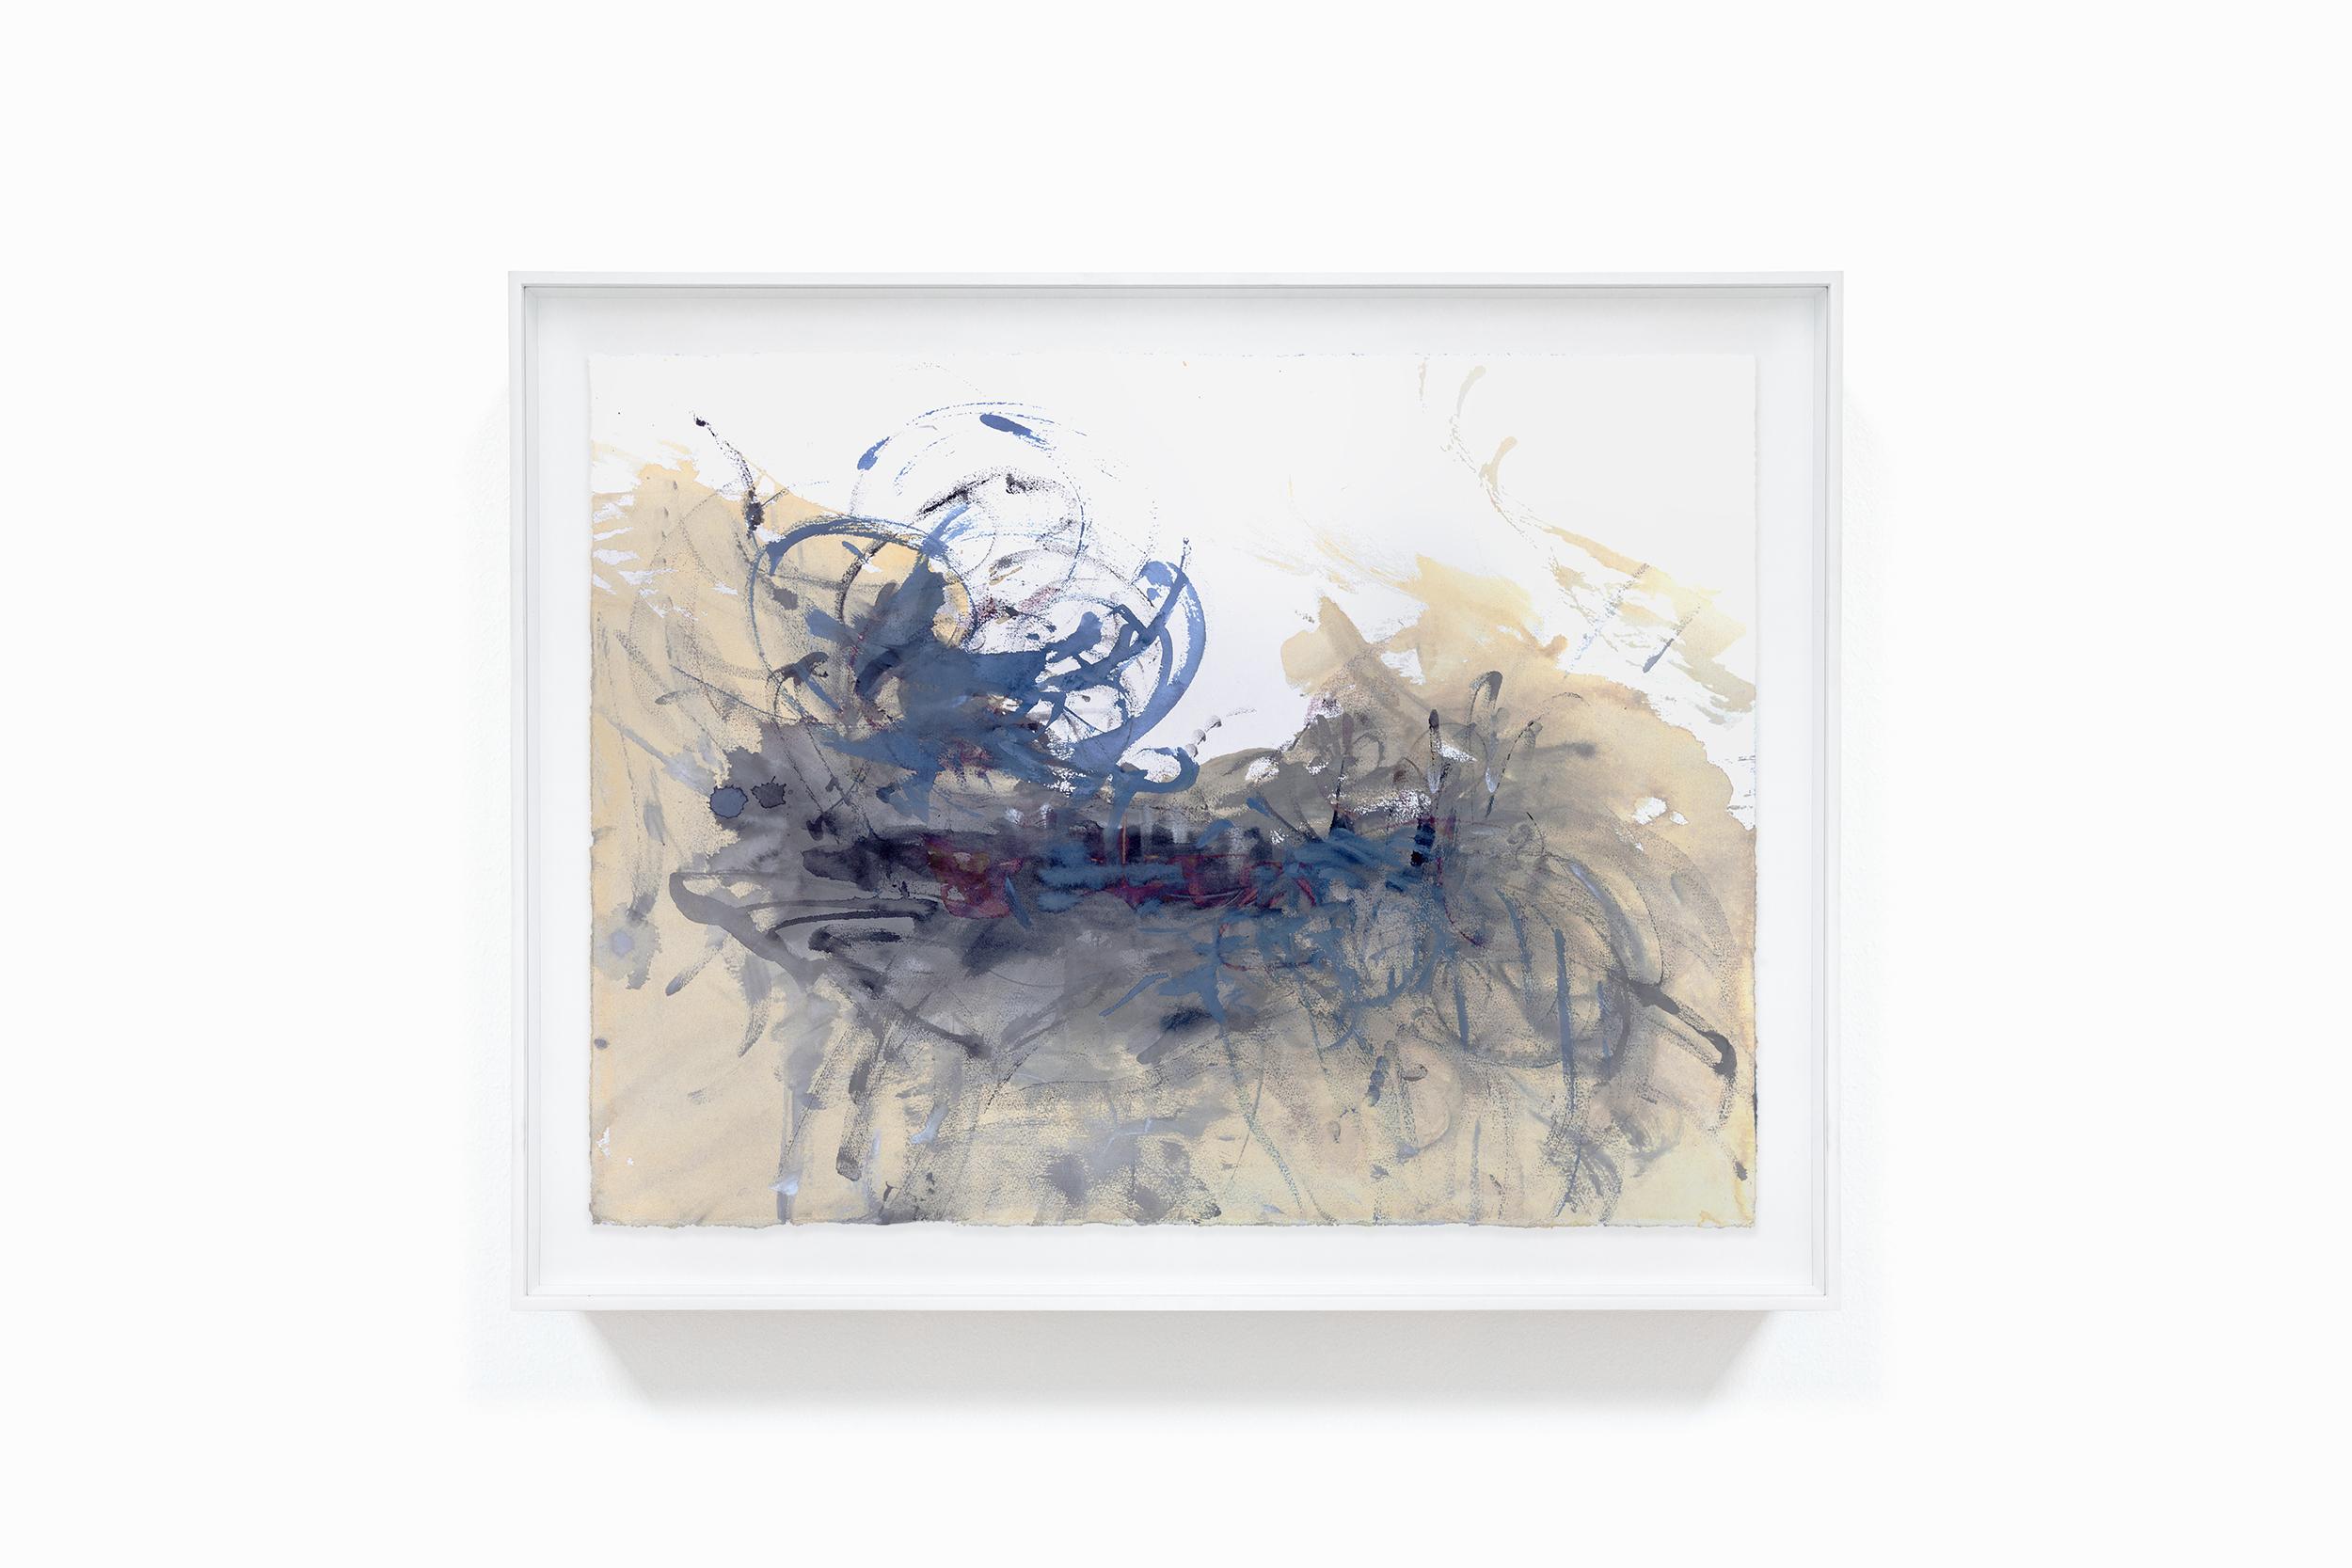 094B Andre Gigante Pintura Painting bonjourmolotov La.jpg